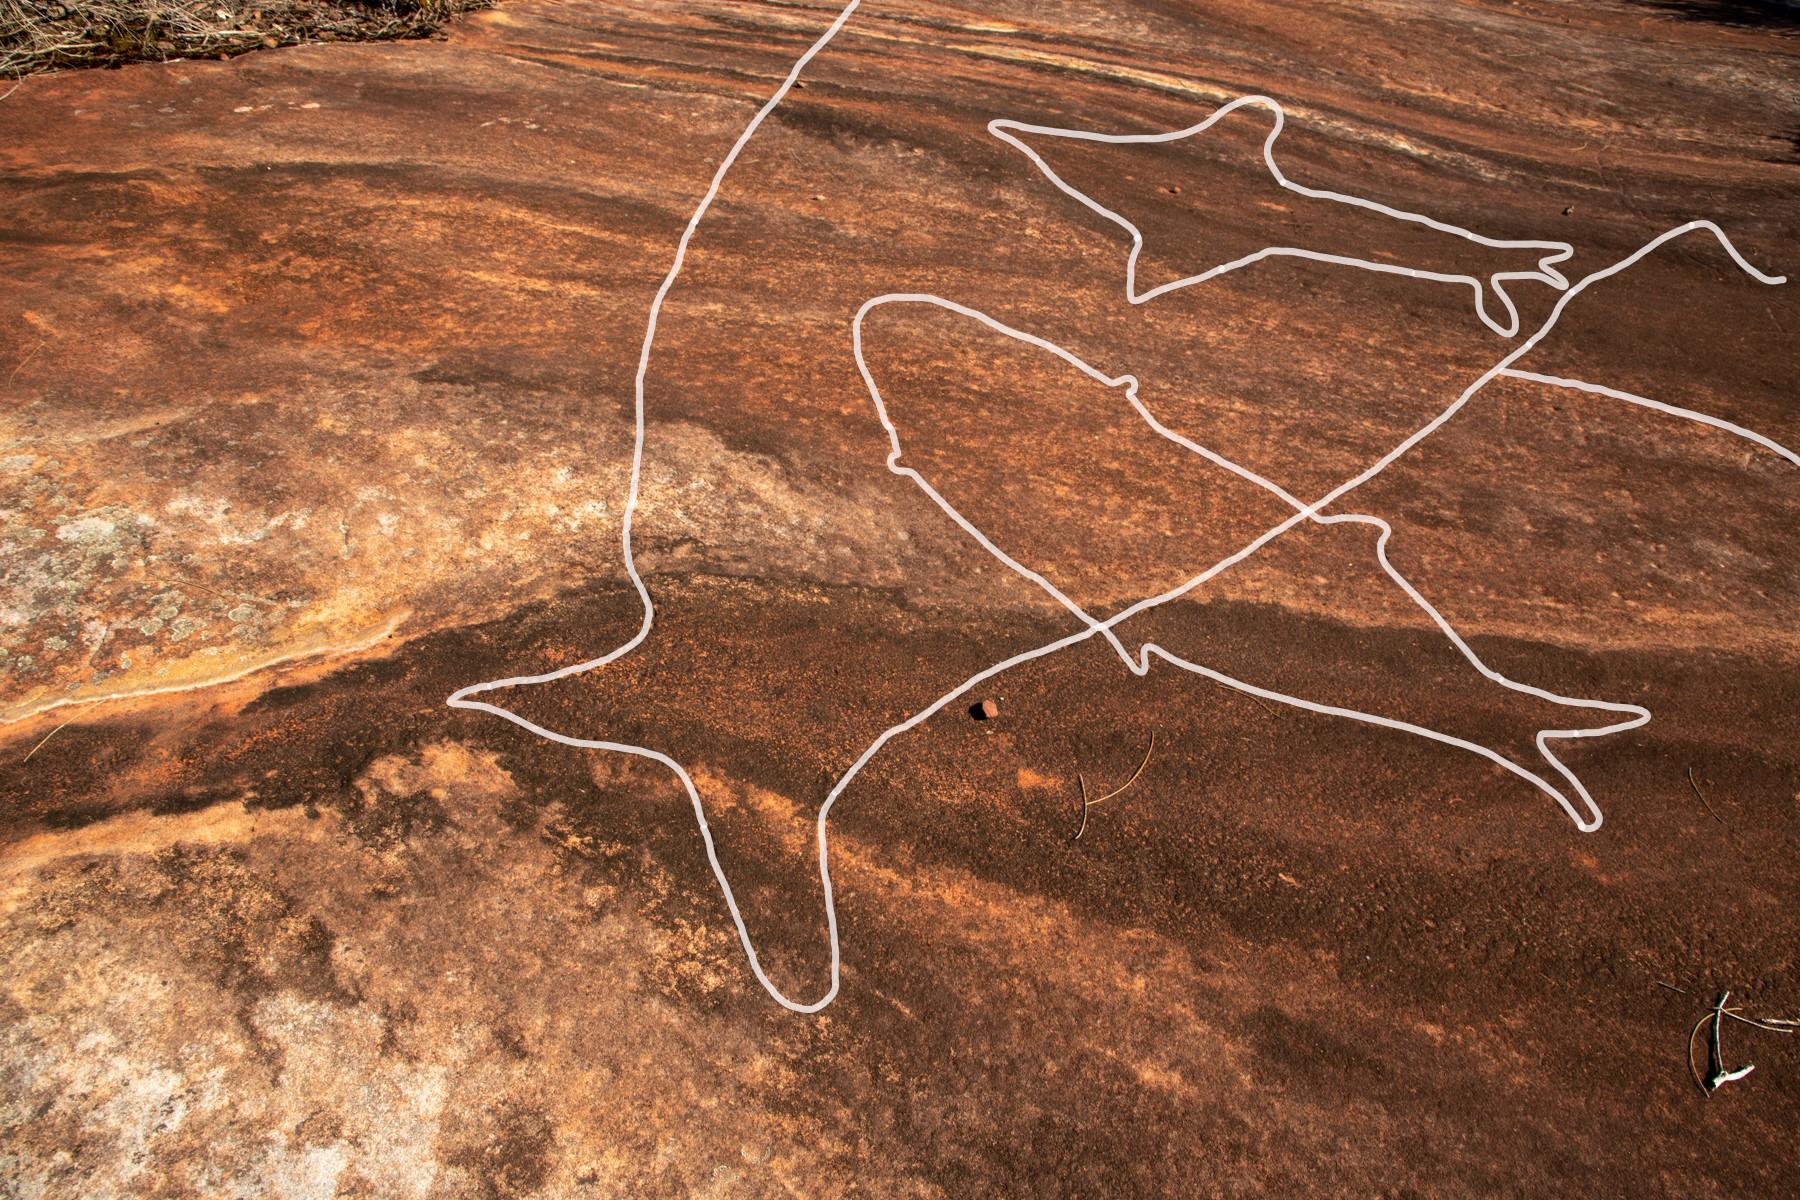 IMG 7603 LR highlighted Basin and Mackerel Track Aboriginal sites